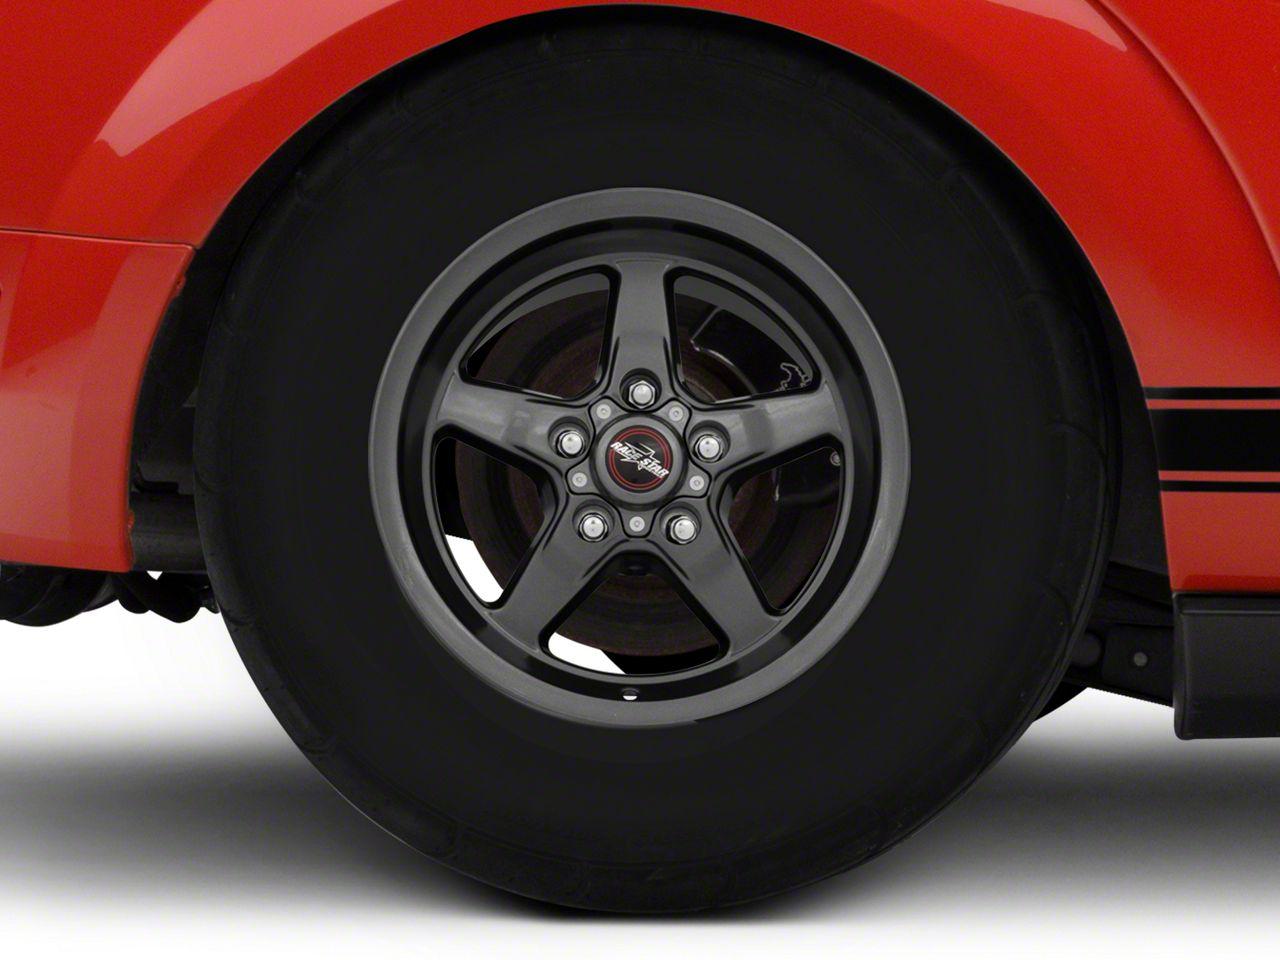 Race Star 92 Drag Star Bracket Racer Metallic Gray Wheel - 15x10 (05-14 All, Excluding 13-14 GT500)